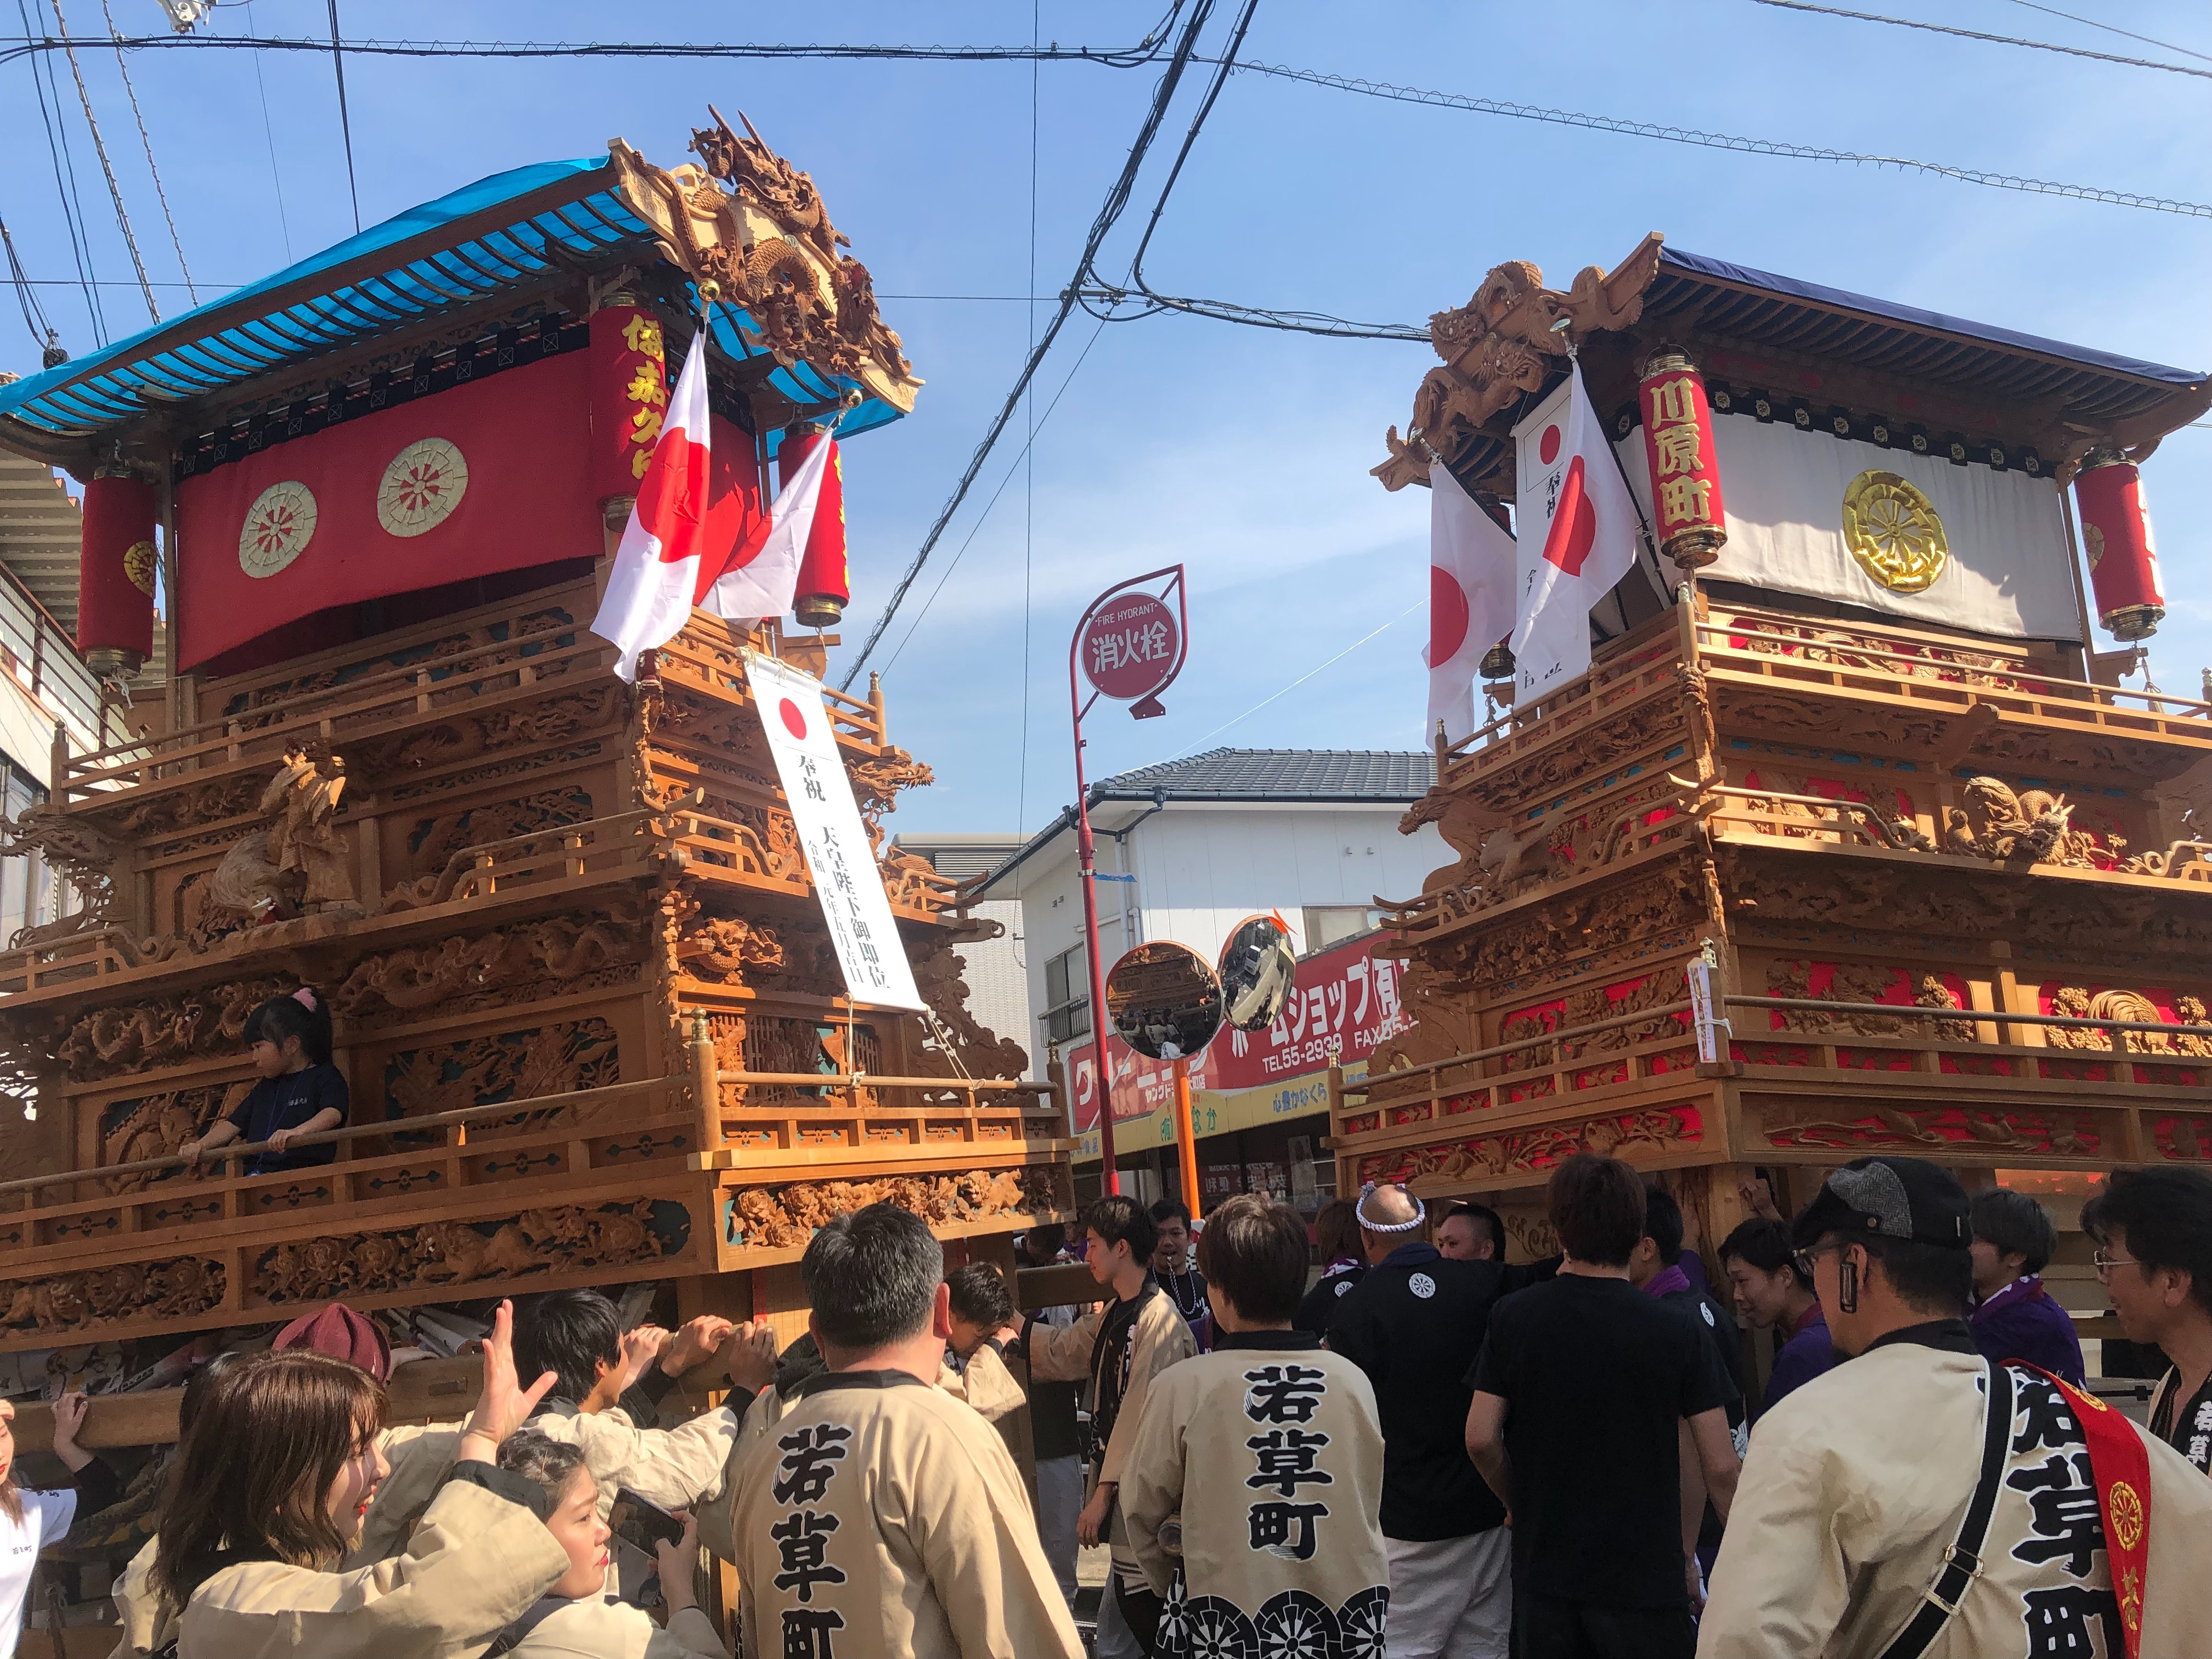 f:id:masanori-kato1972:20190504182832j:image